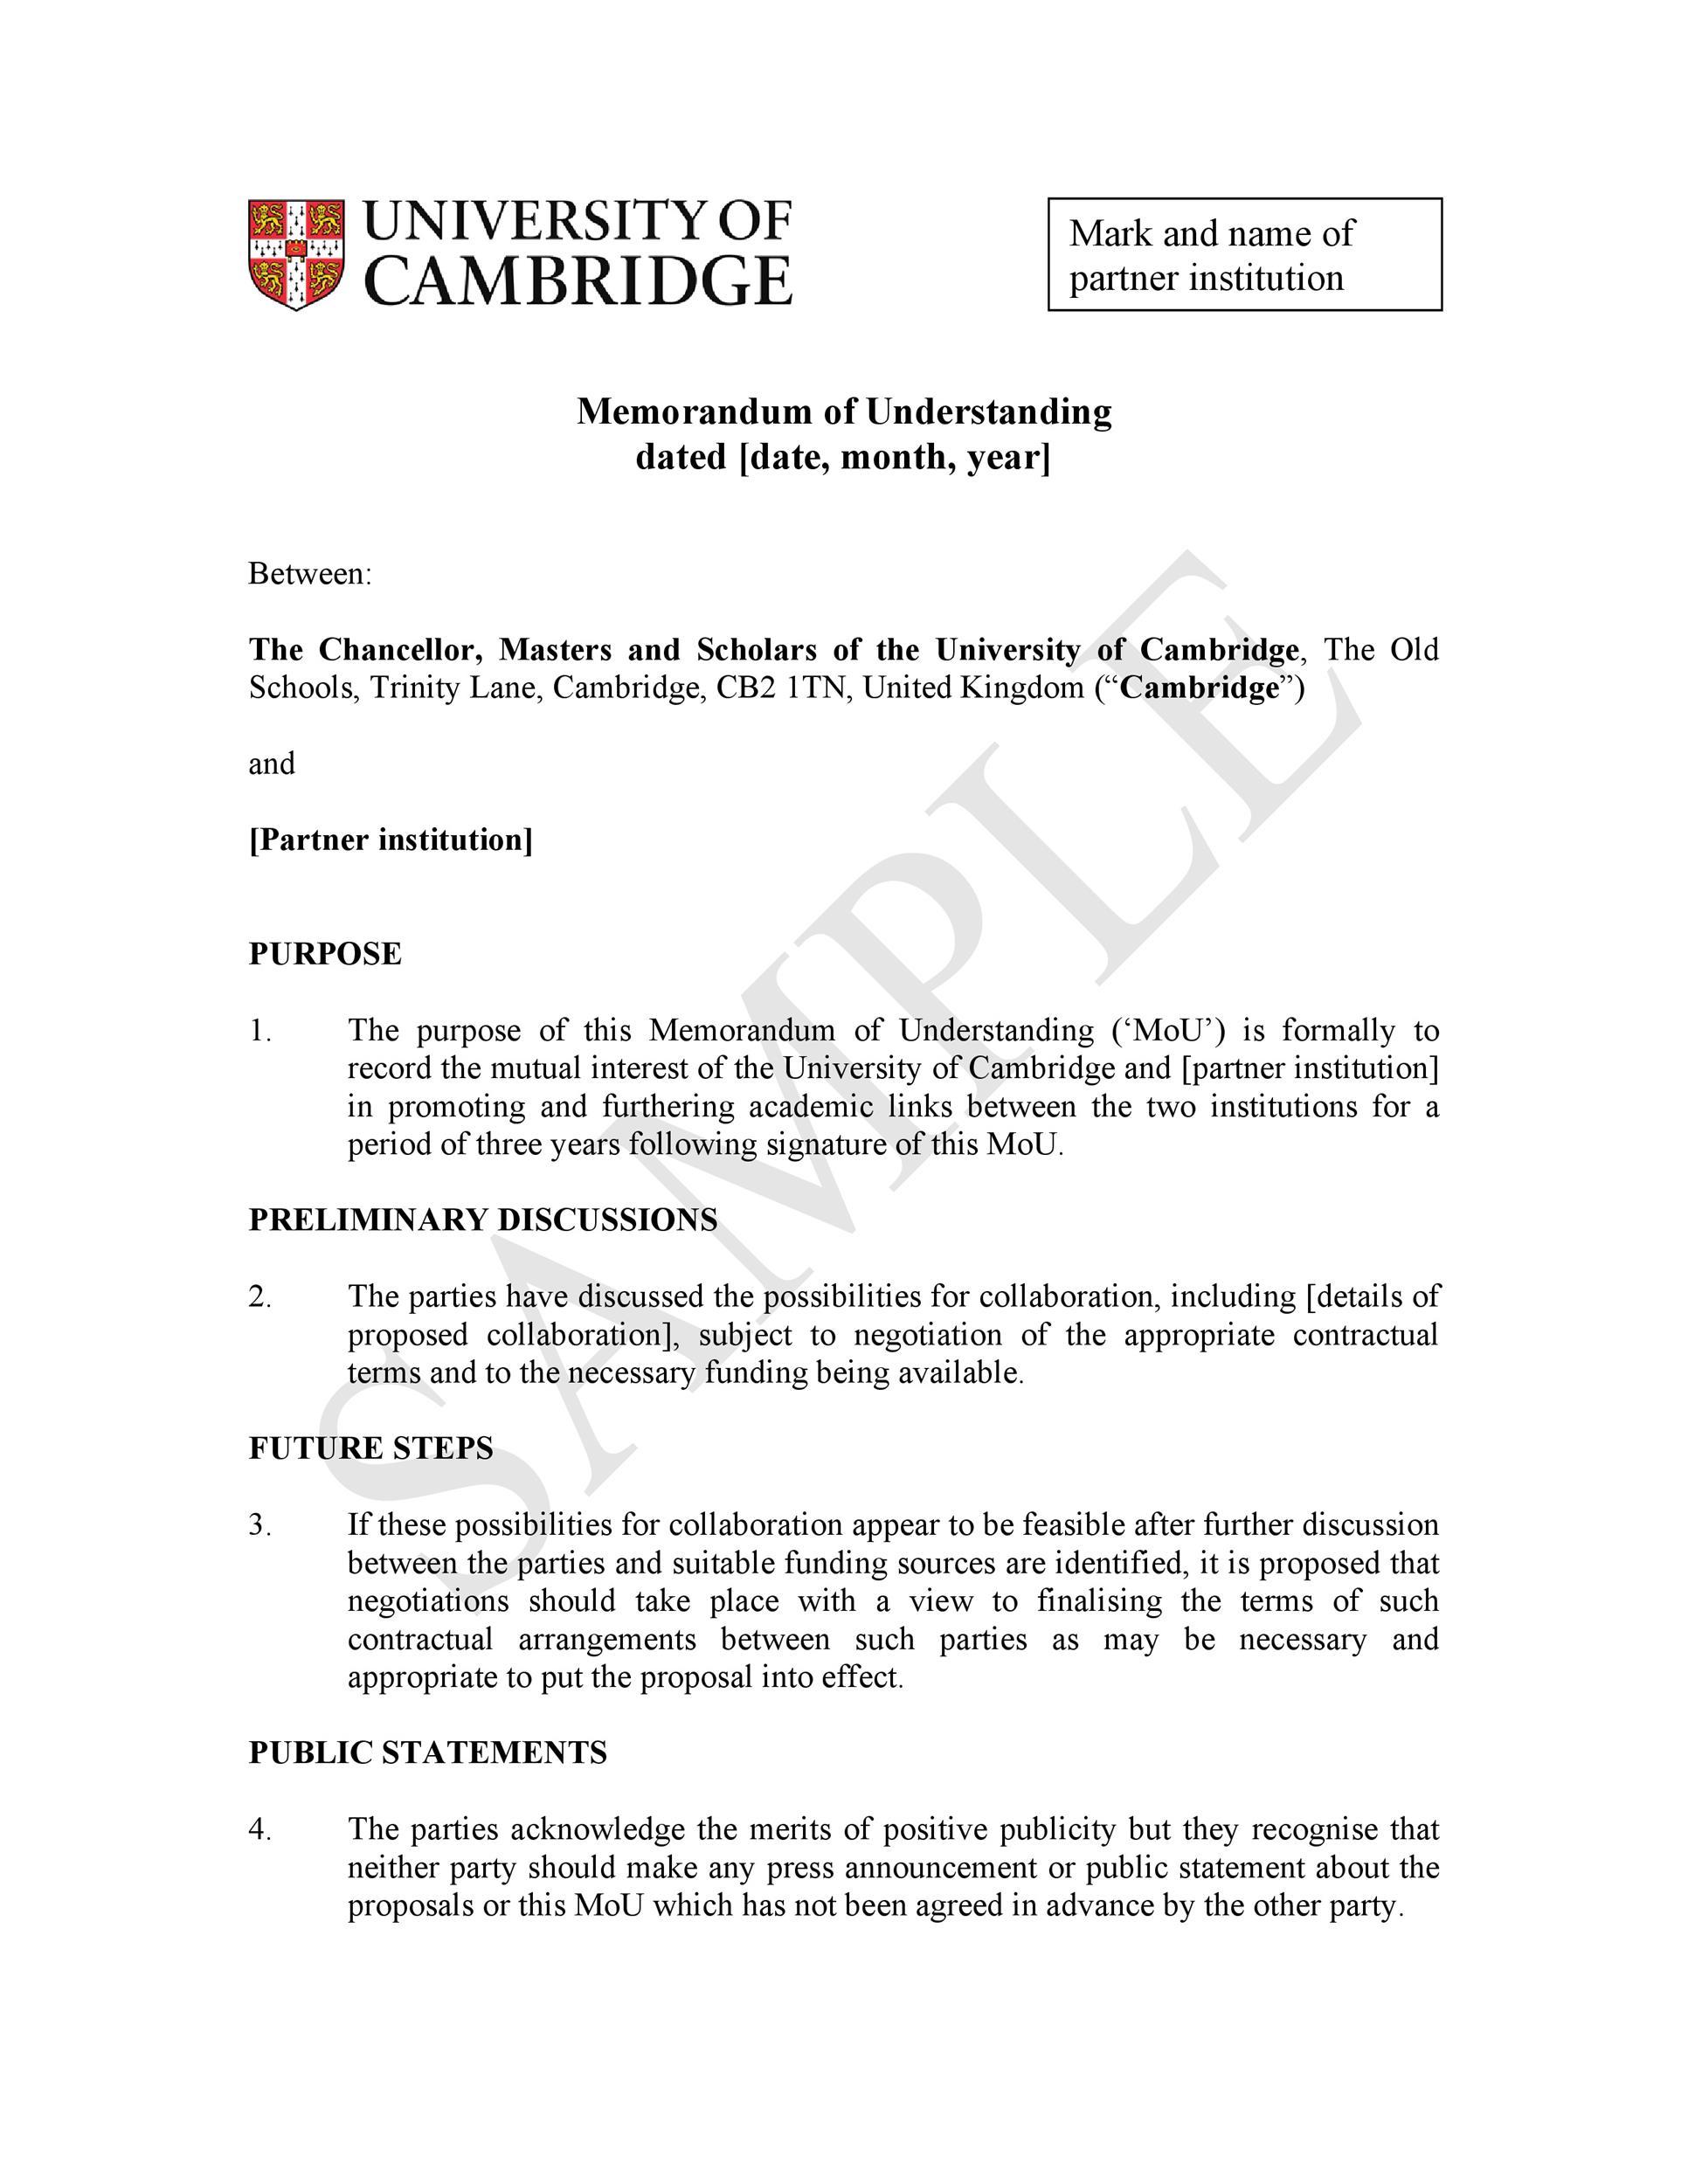 Free Memorandum of Understanding Template 30